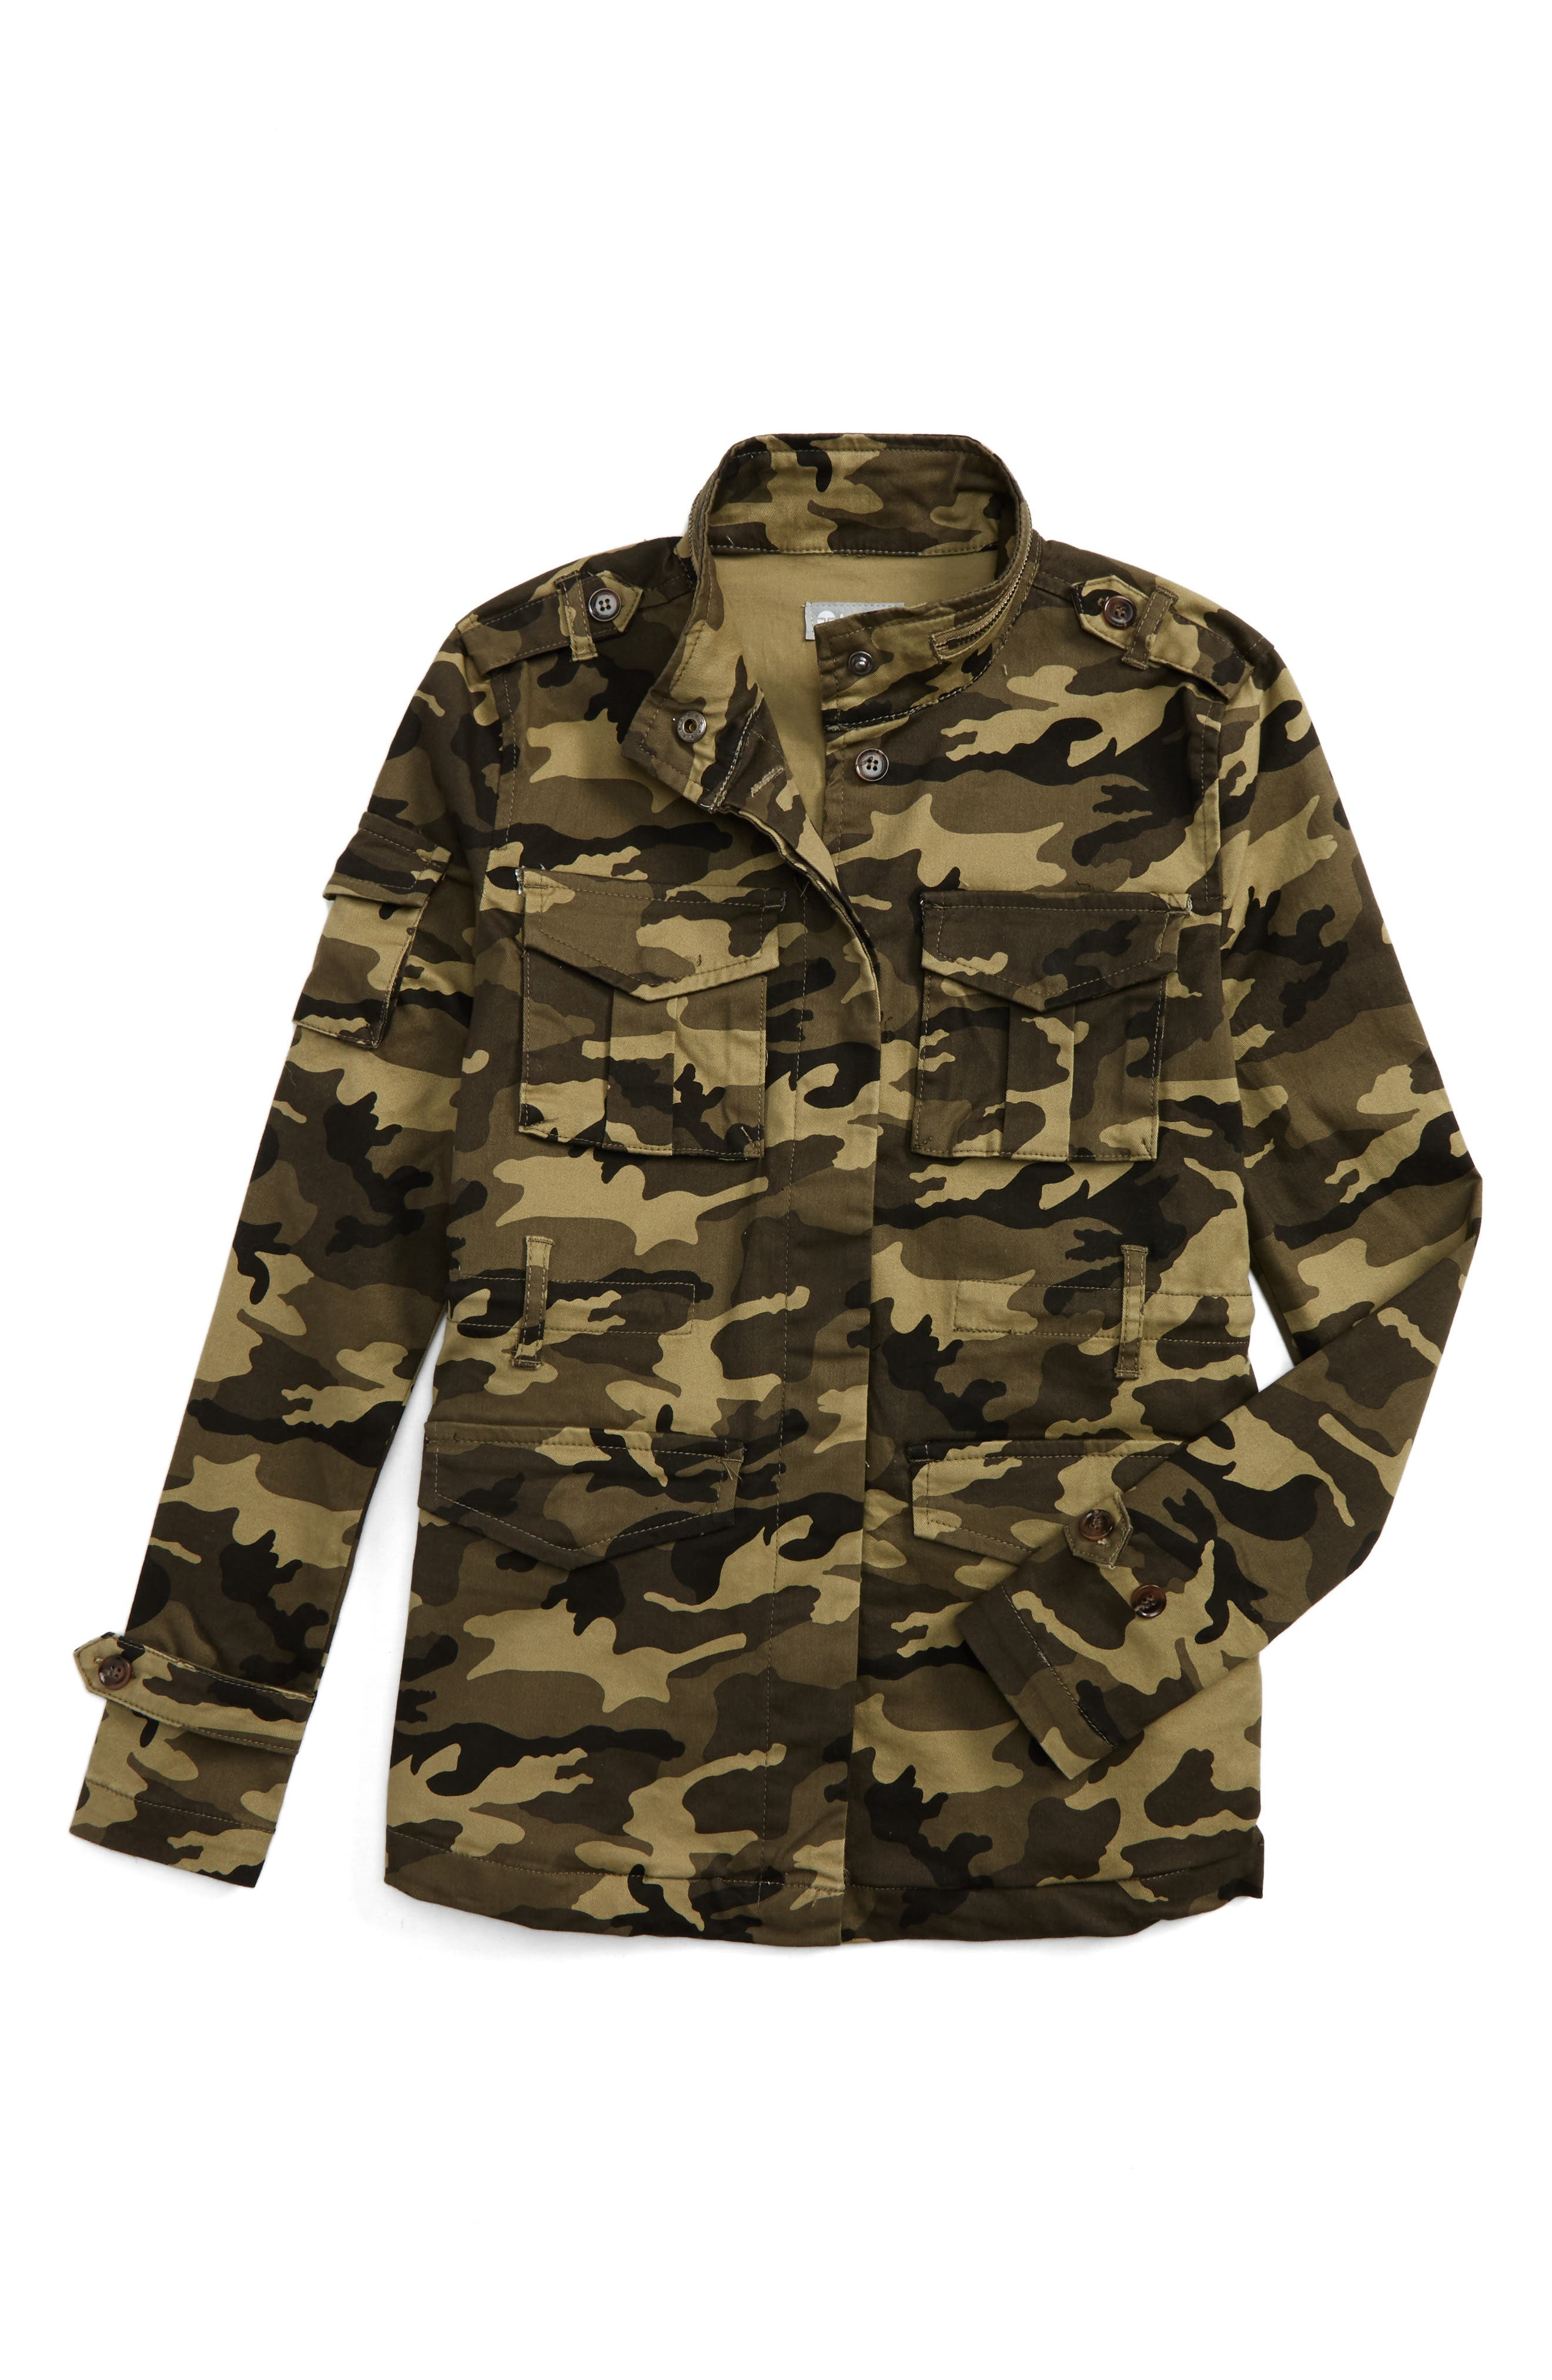 Tractr Camo Anorak Jacket (Big Girls)